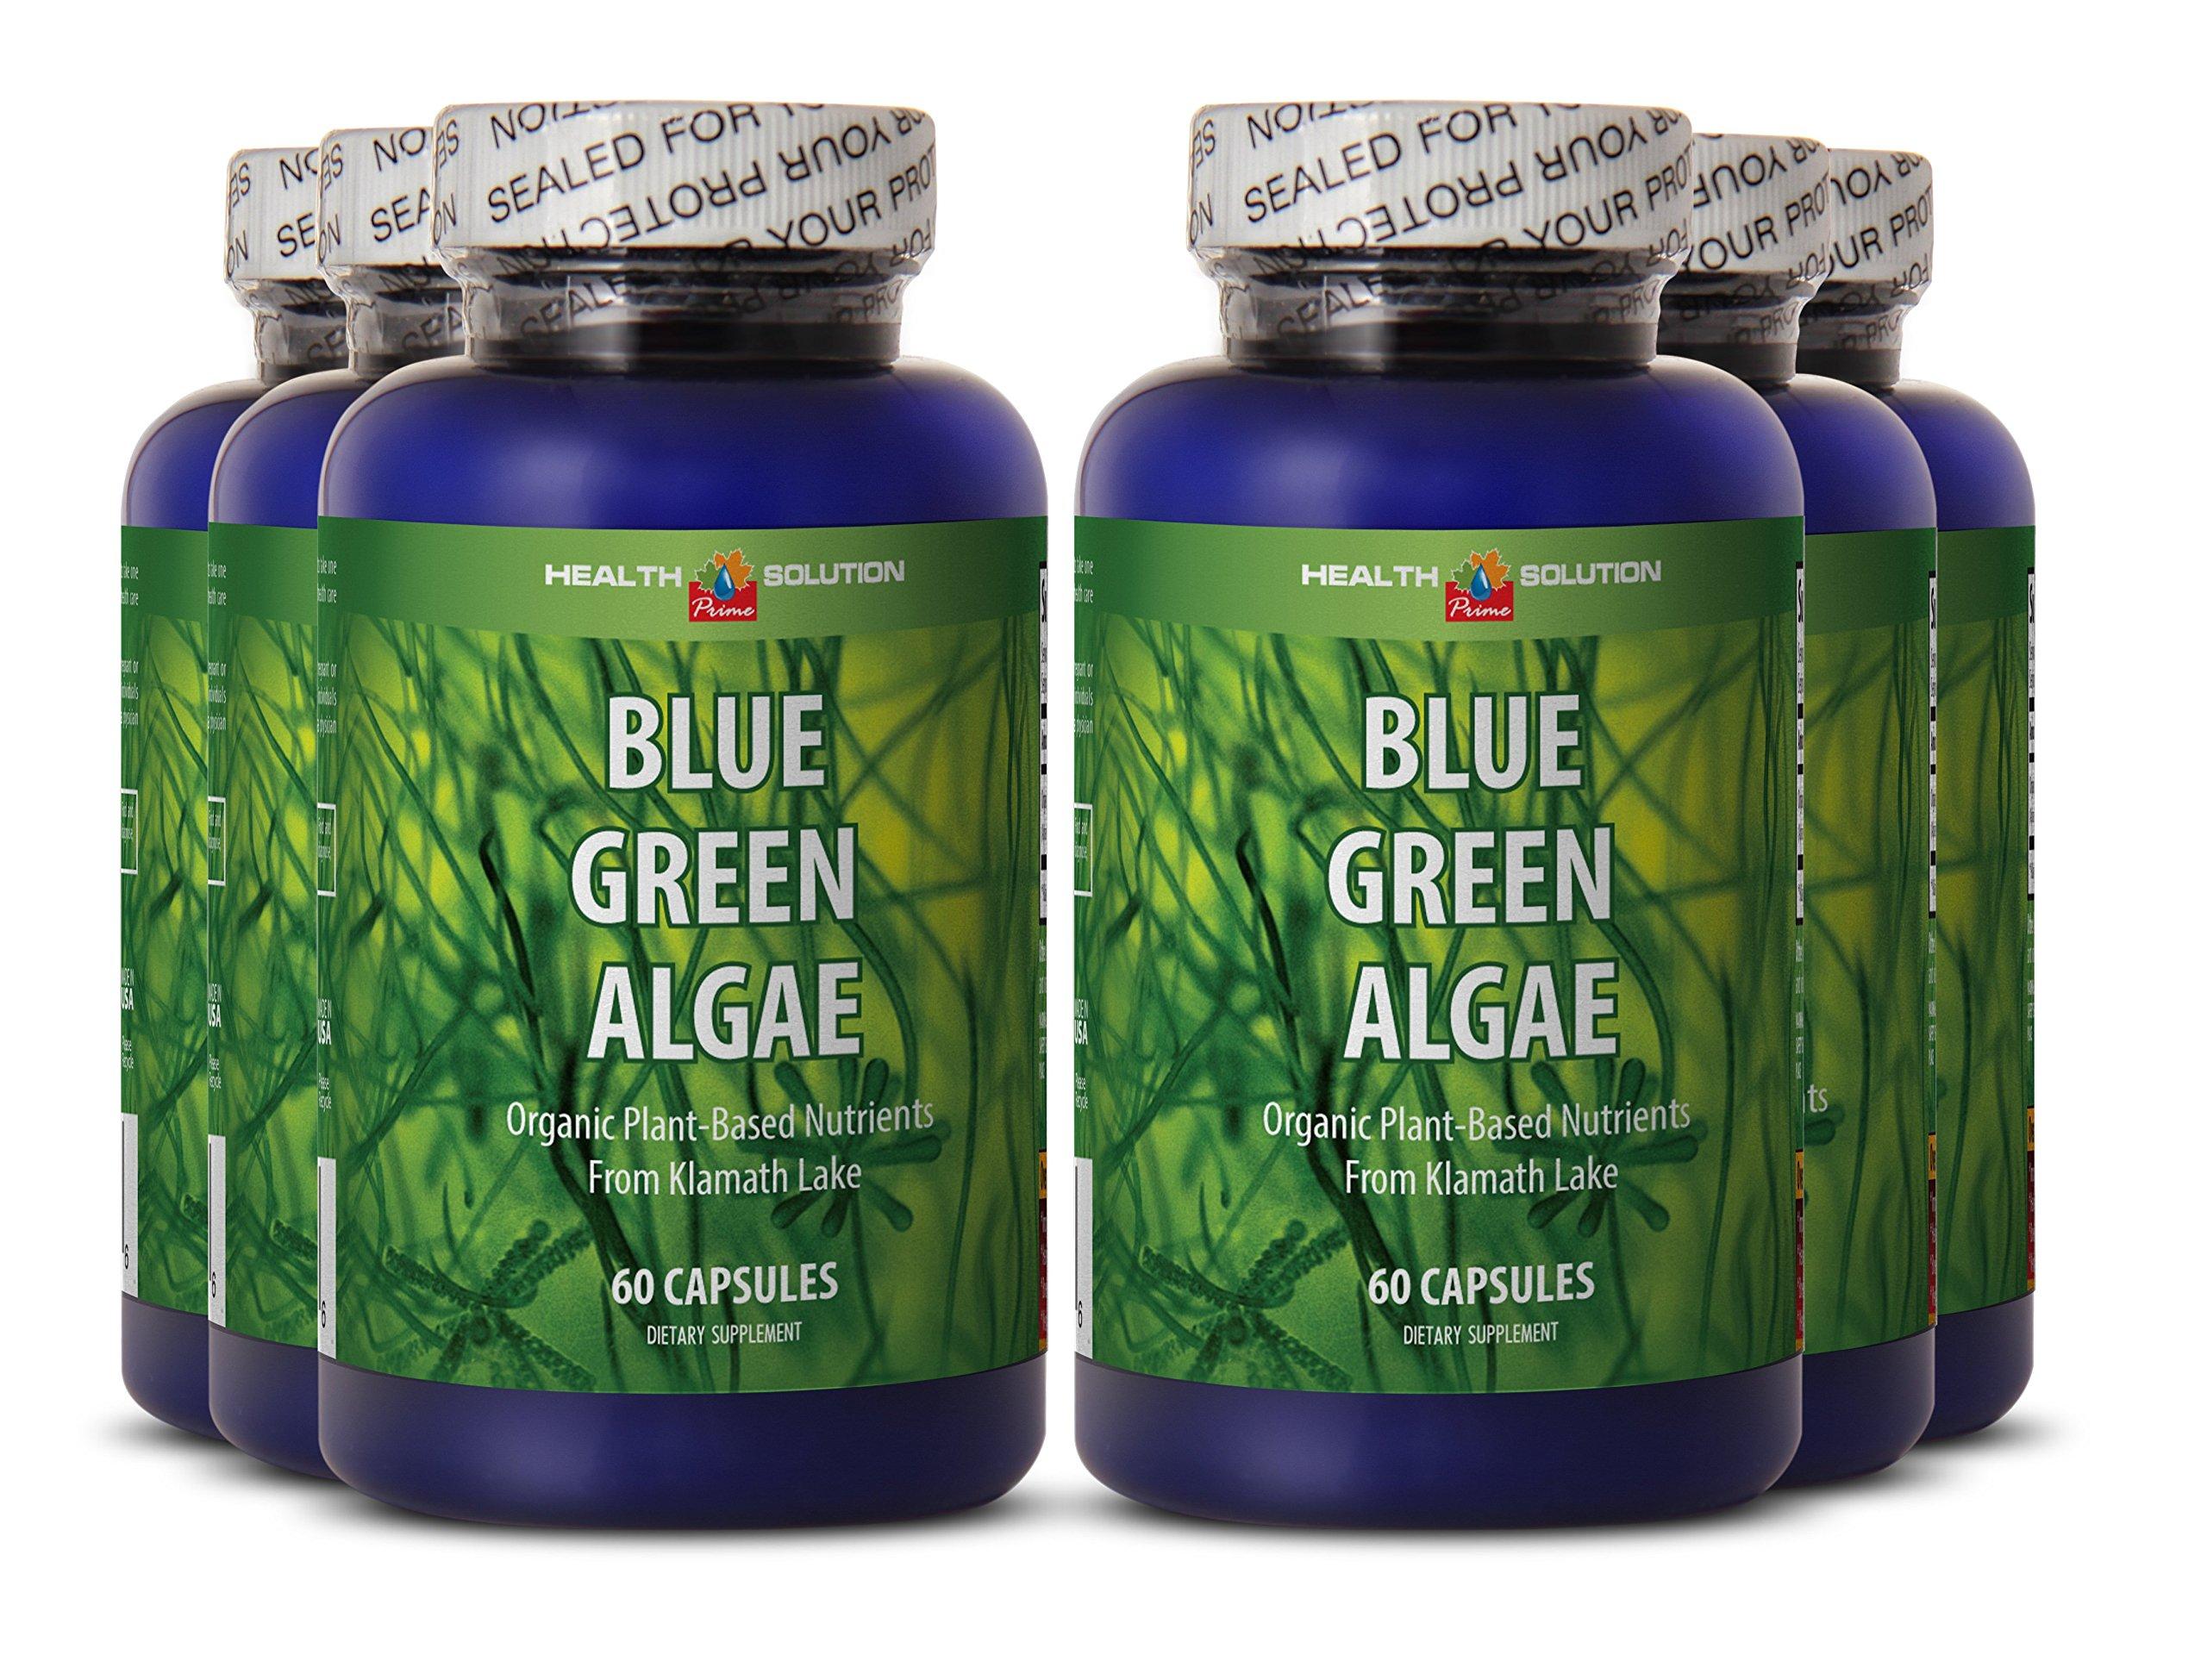 Blue algae supplement - BLUE GREEN ALGAE - prevent candida overgrowth (6 bottles) by Health Solution Prime